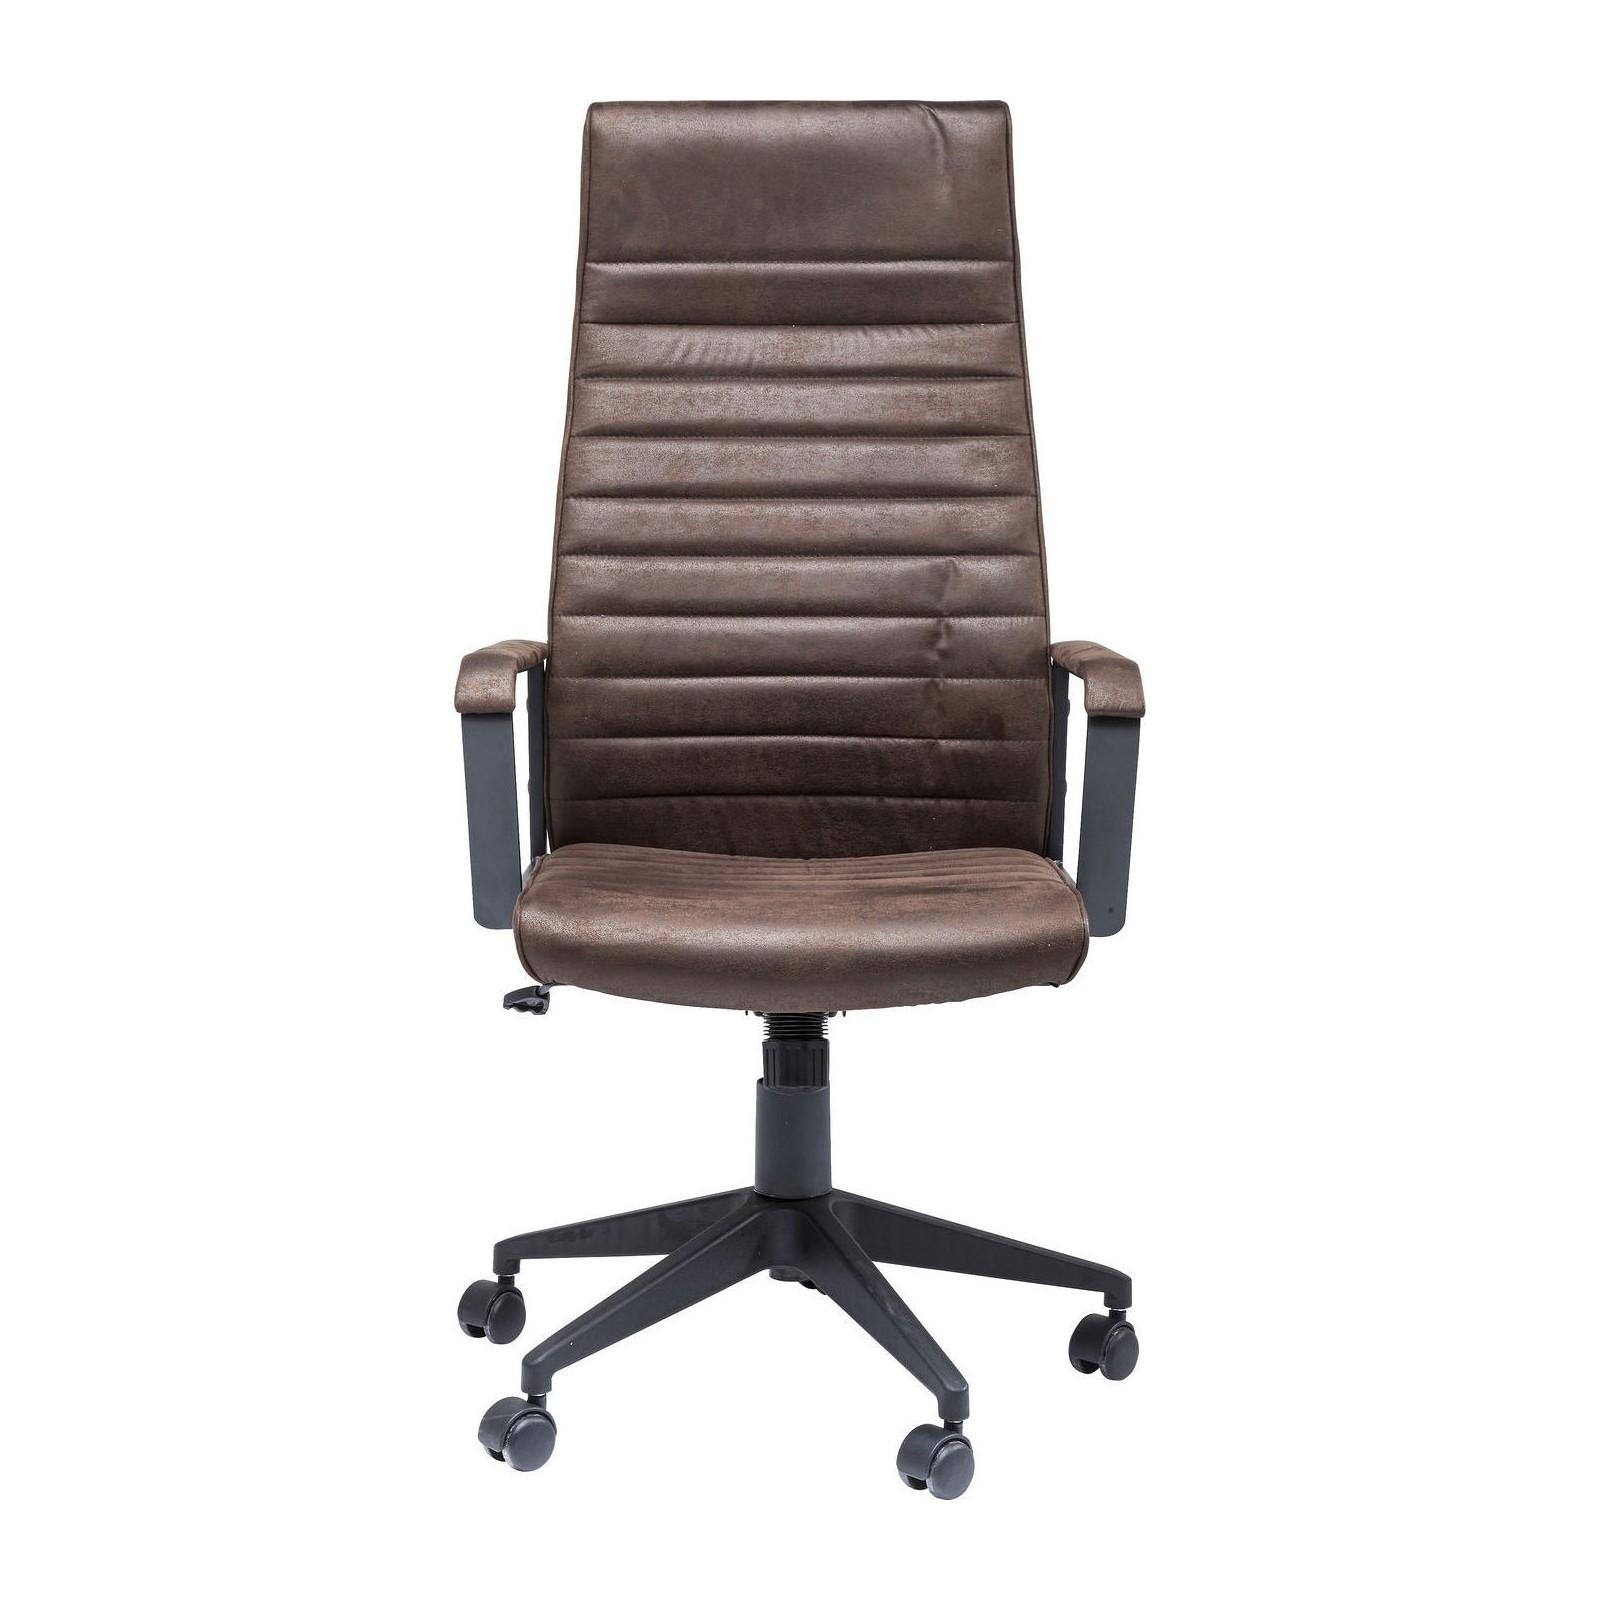 choisir sa chaise de bureau nos conseils kare click. Black Bedroom Furniture Sets. Home Design Ideas